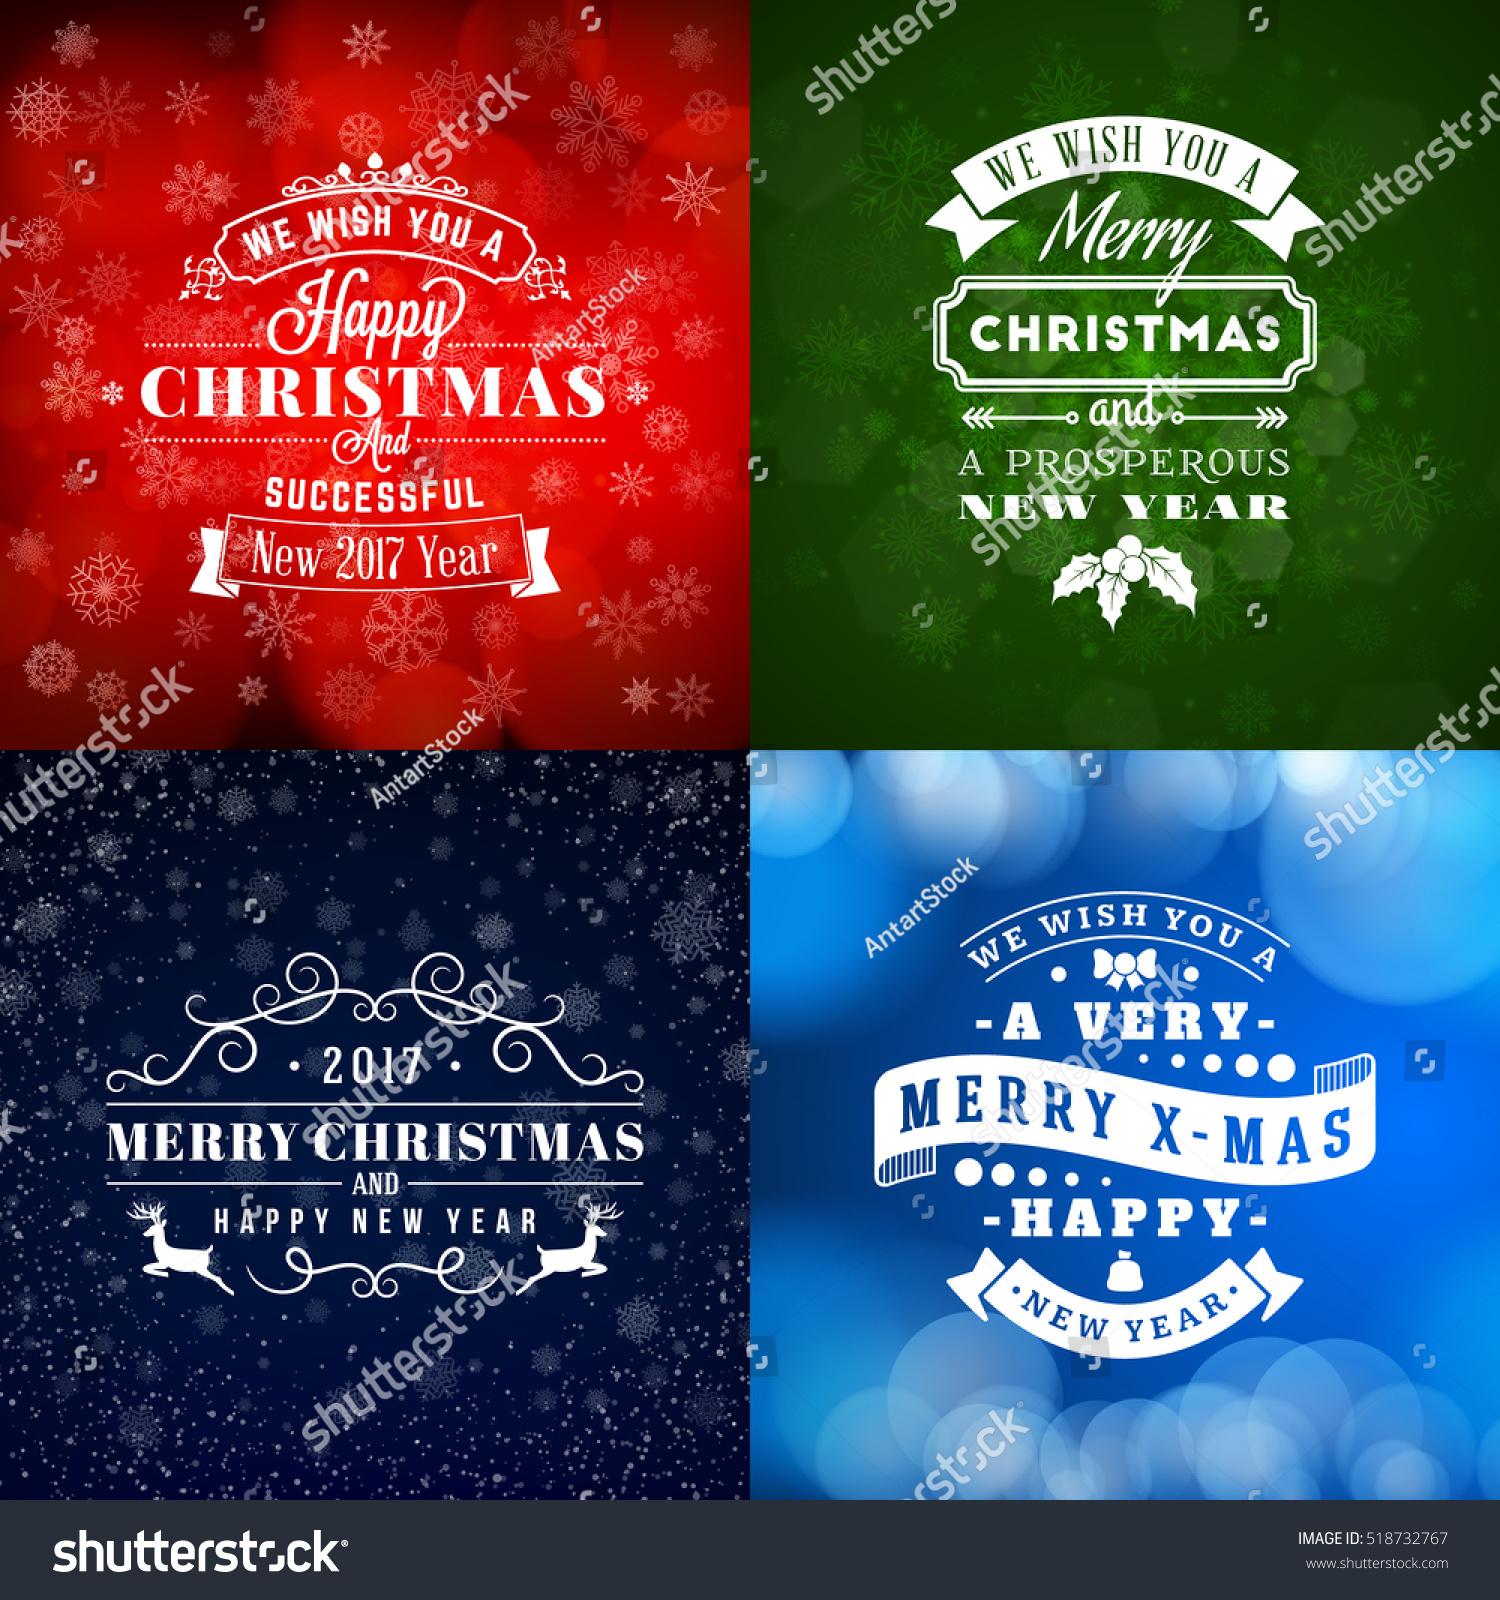 Decorative Wedding Invitation Badge 7: Set Of Merry Christmas And Happy New Year Decorative